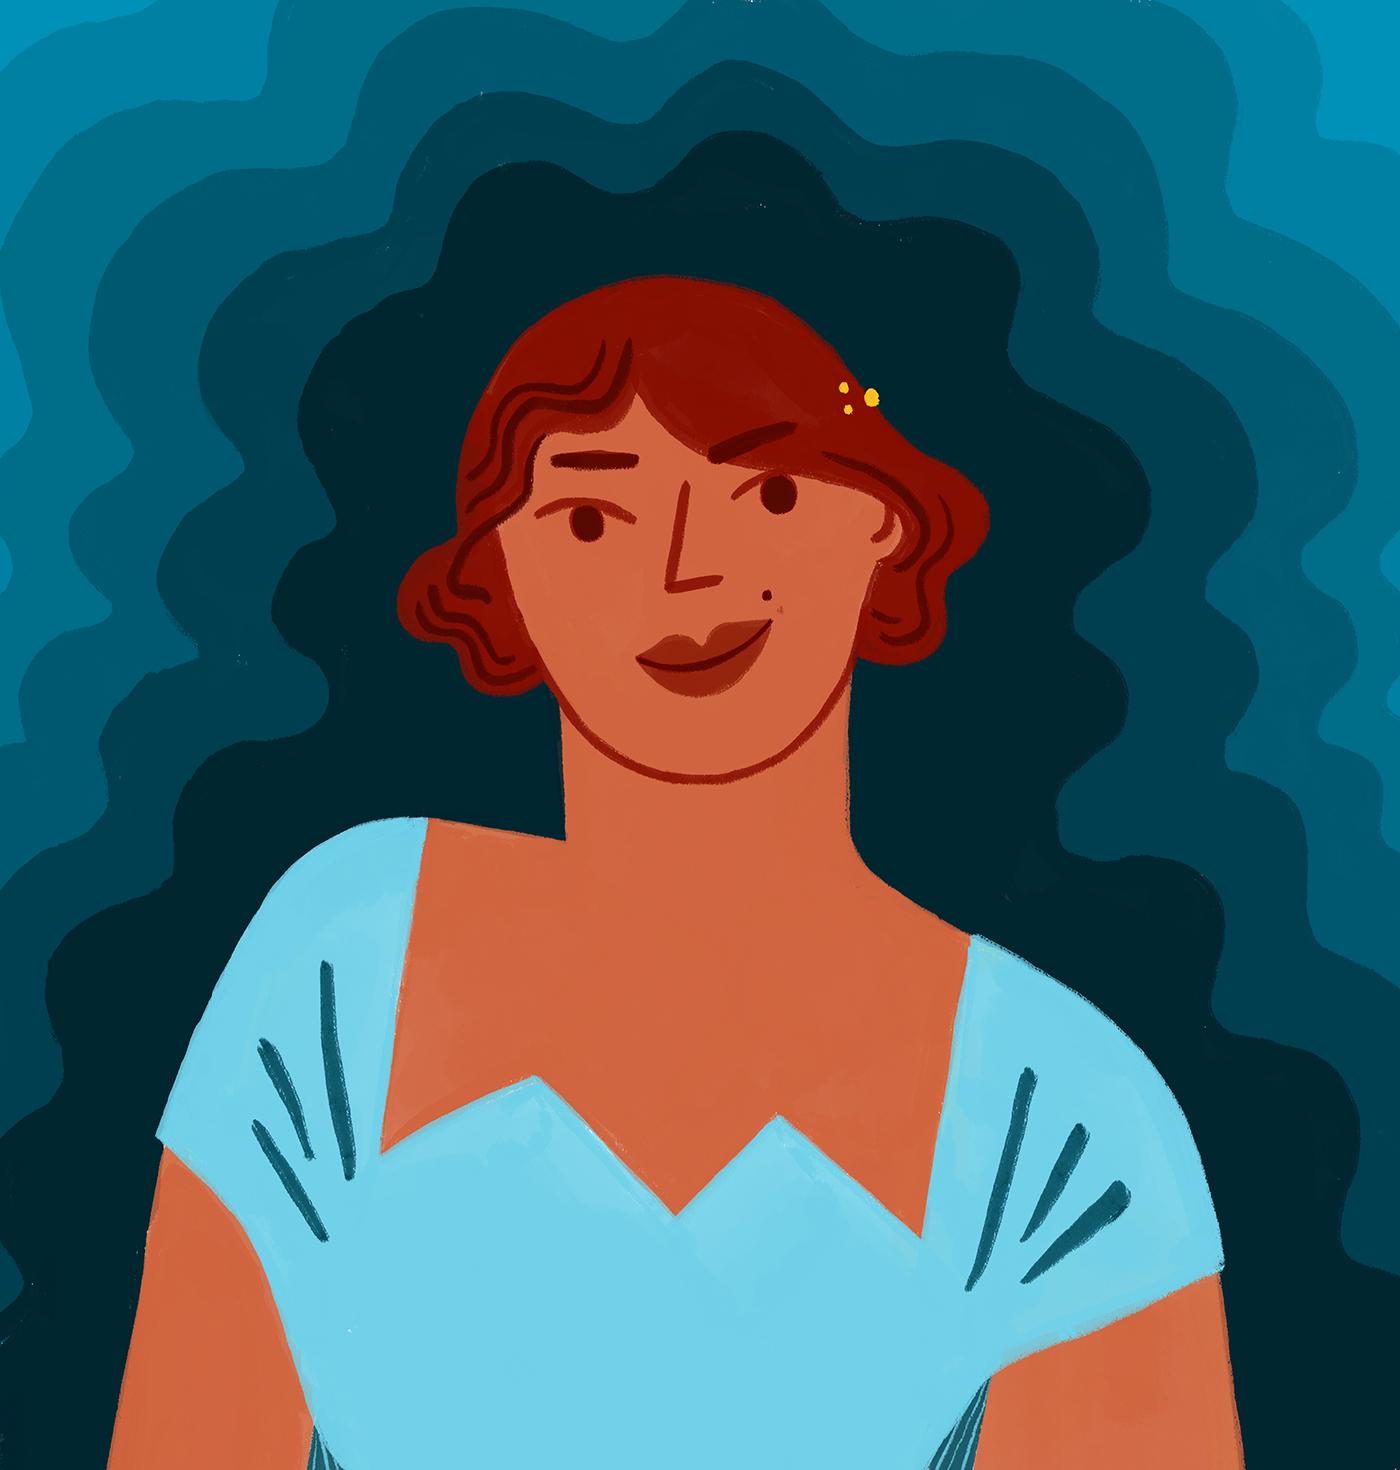 woman-star-vintage-dress-gucci-fashion-illustration-portrait-blue-violeta-noy